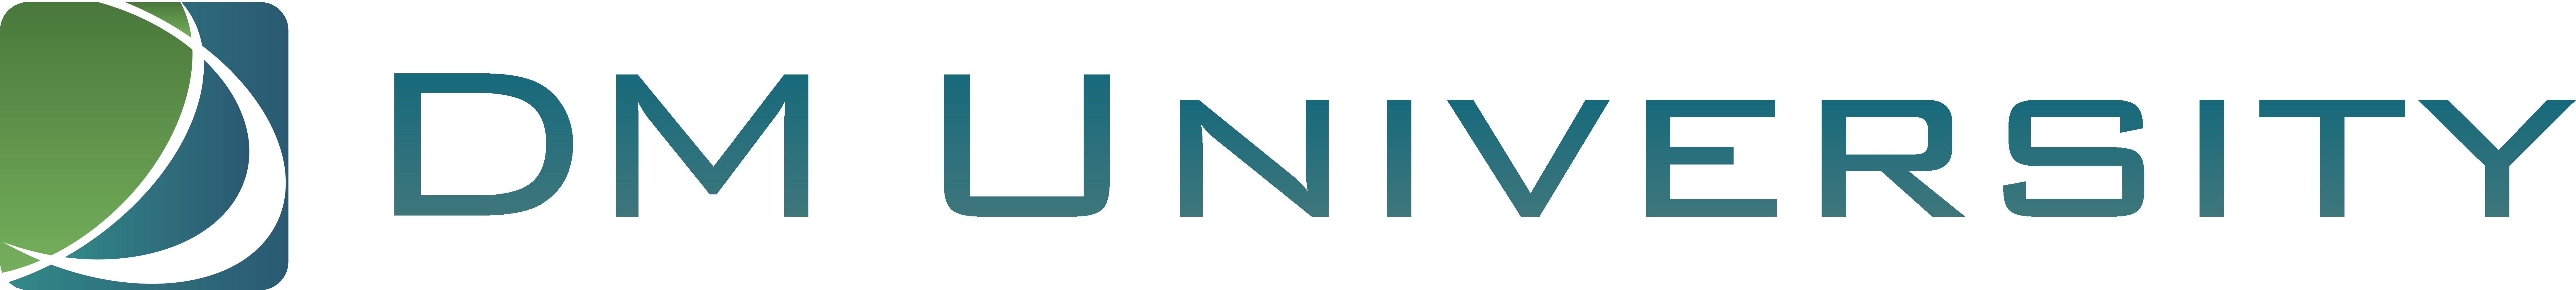 DM University Logo